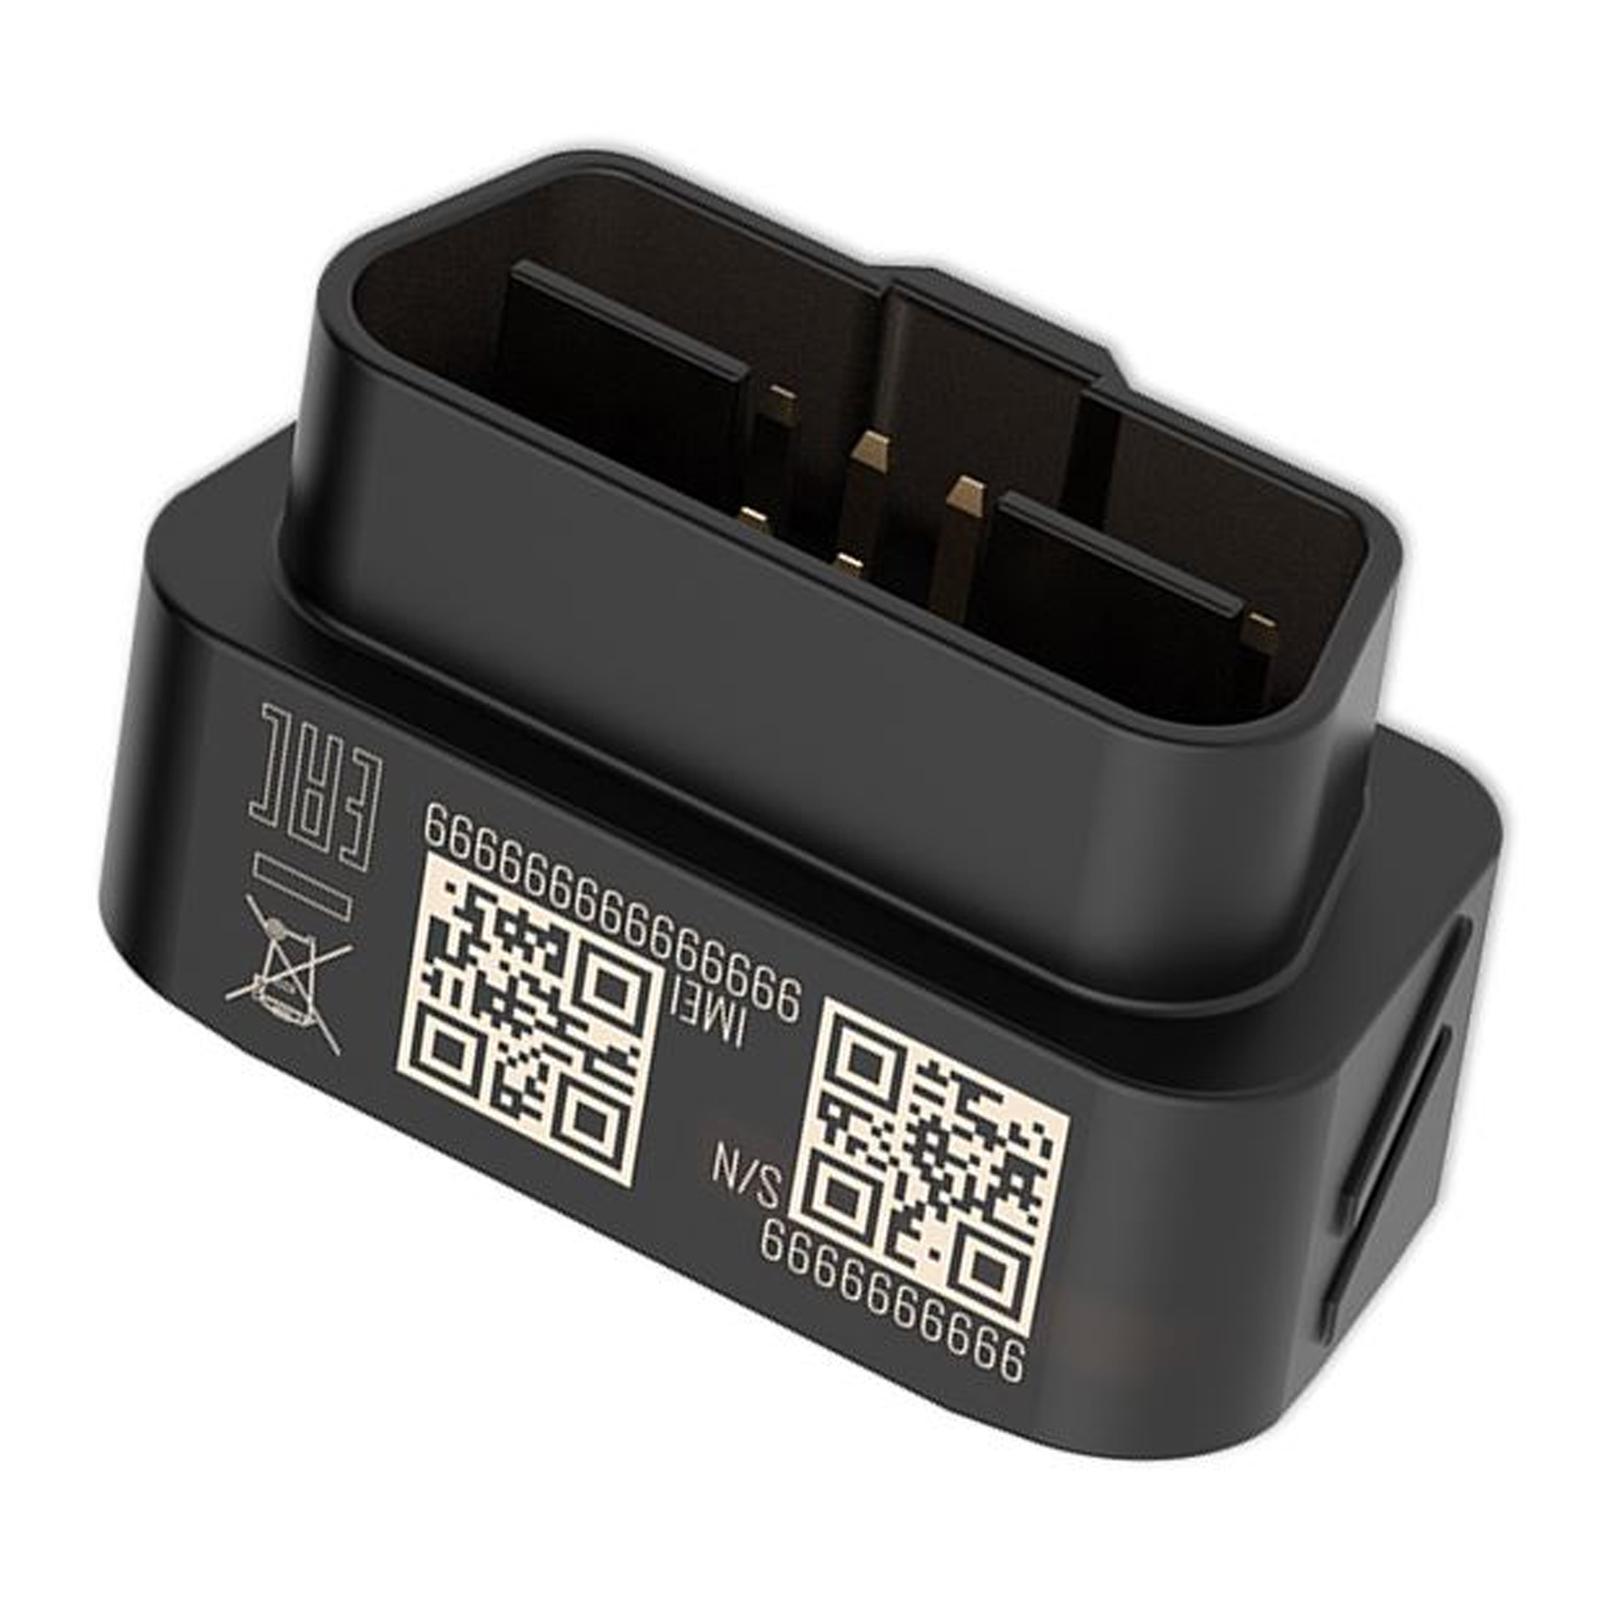 db3-obd-mini-gps-lokator-do-auta-sledovacie-zariadenieDB3 OBD Mini GPS Lokátor do auta Sledovacie zariadenie